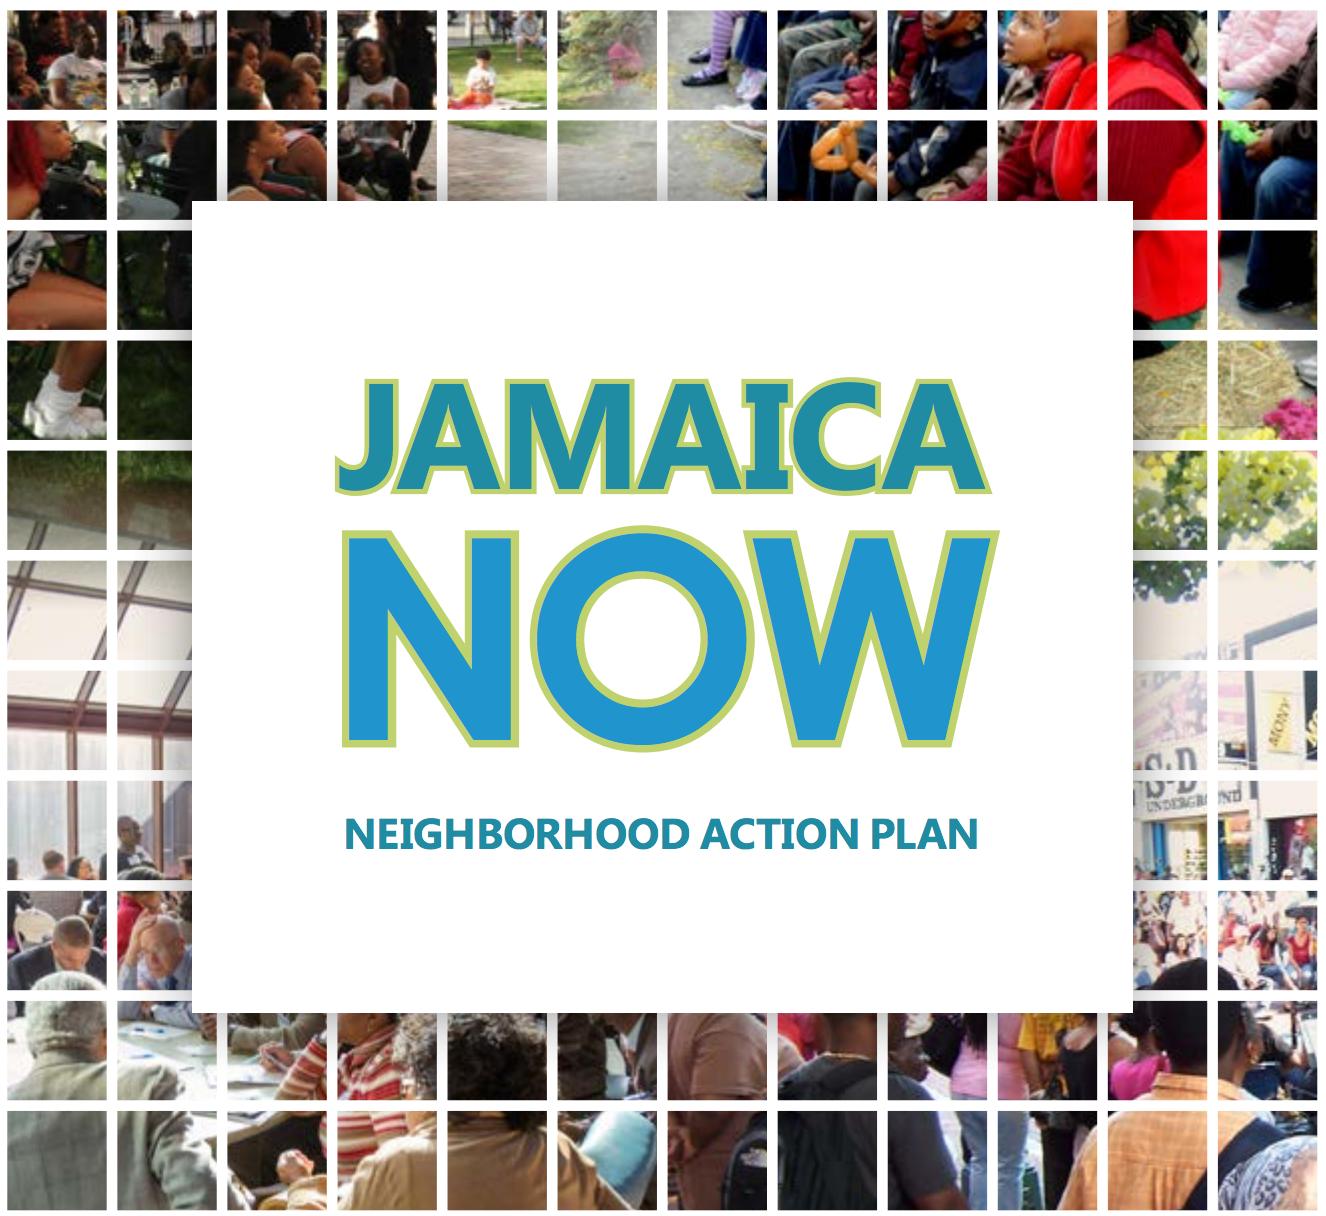 Jamaica Now Neighborhood Action Plan